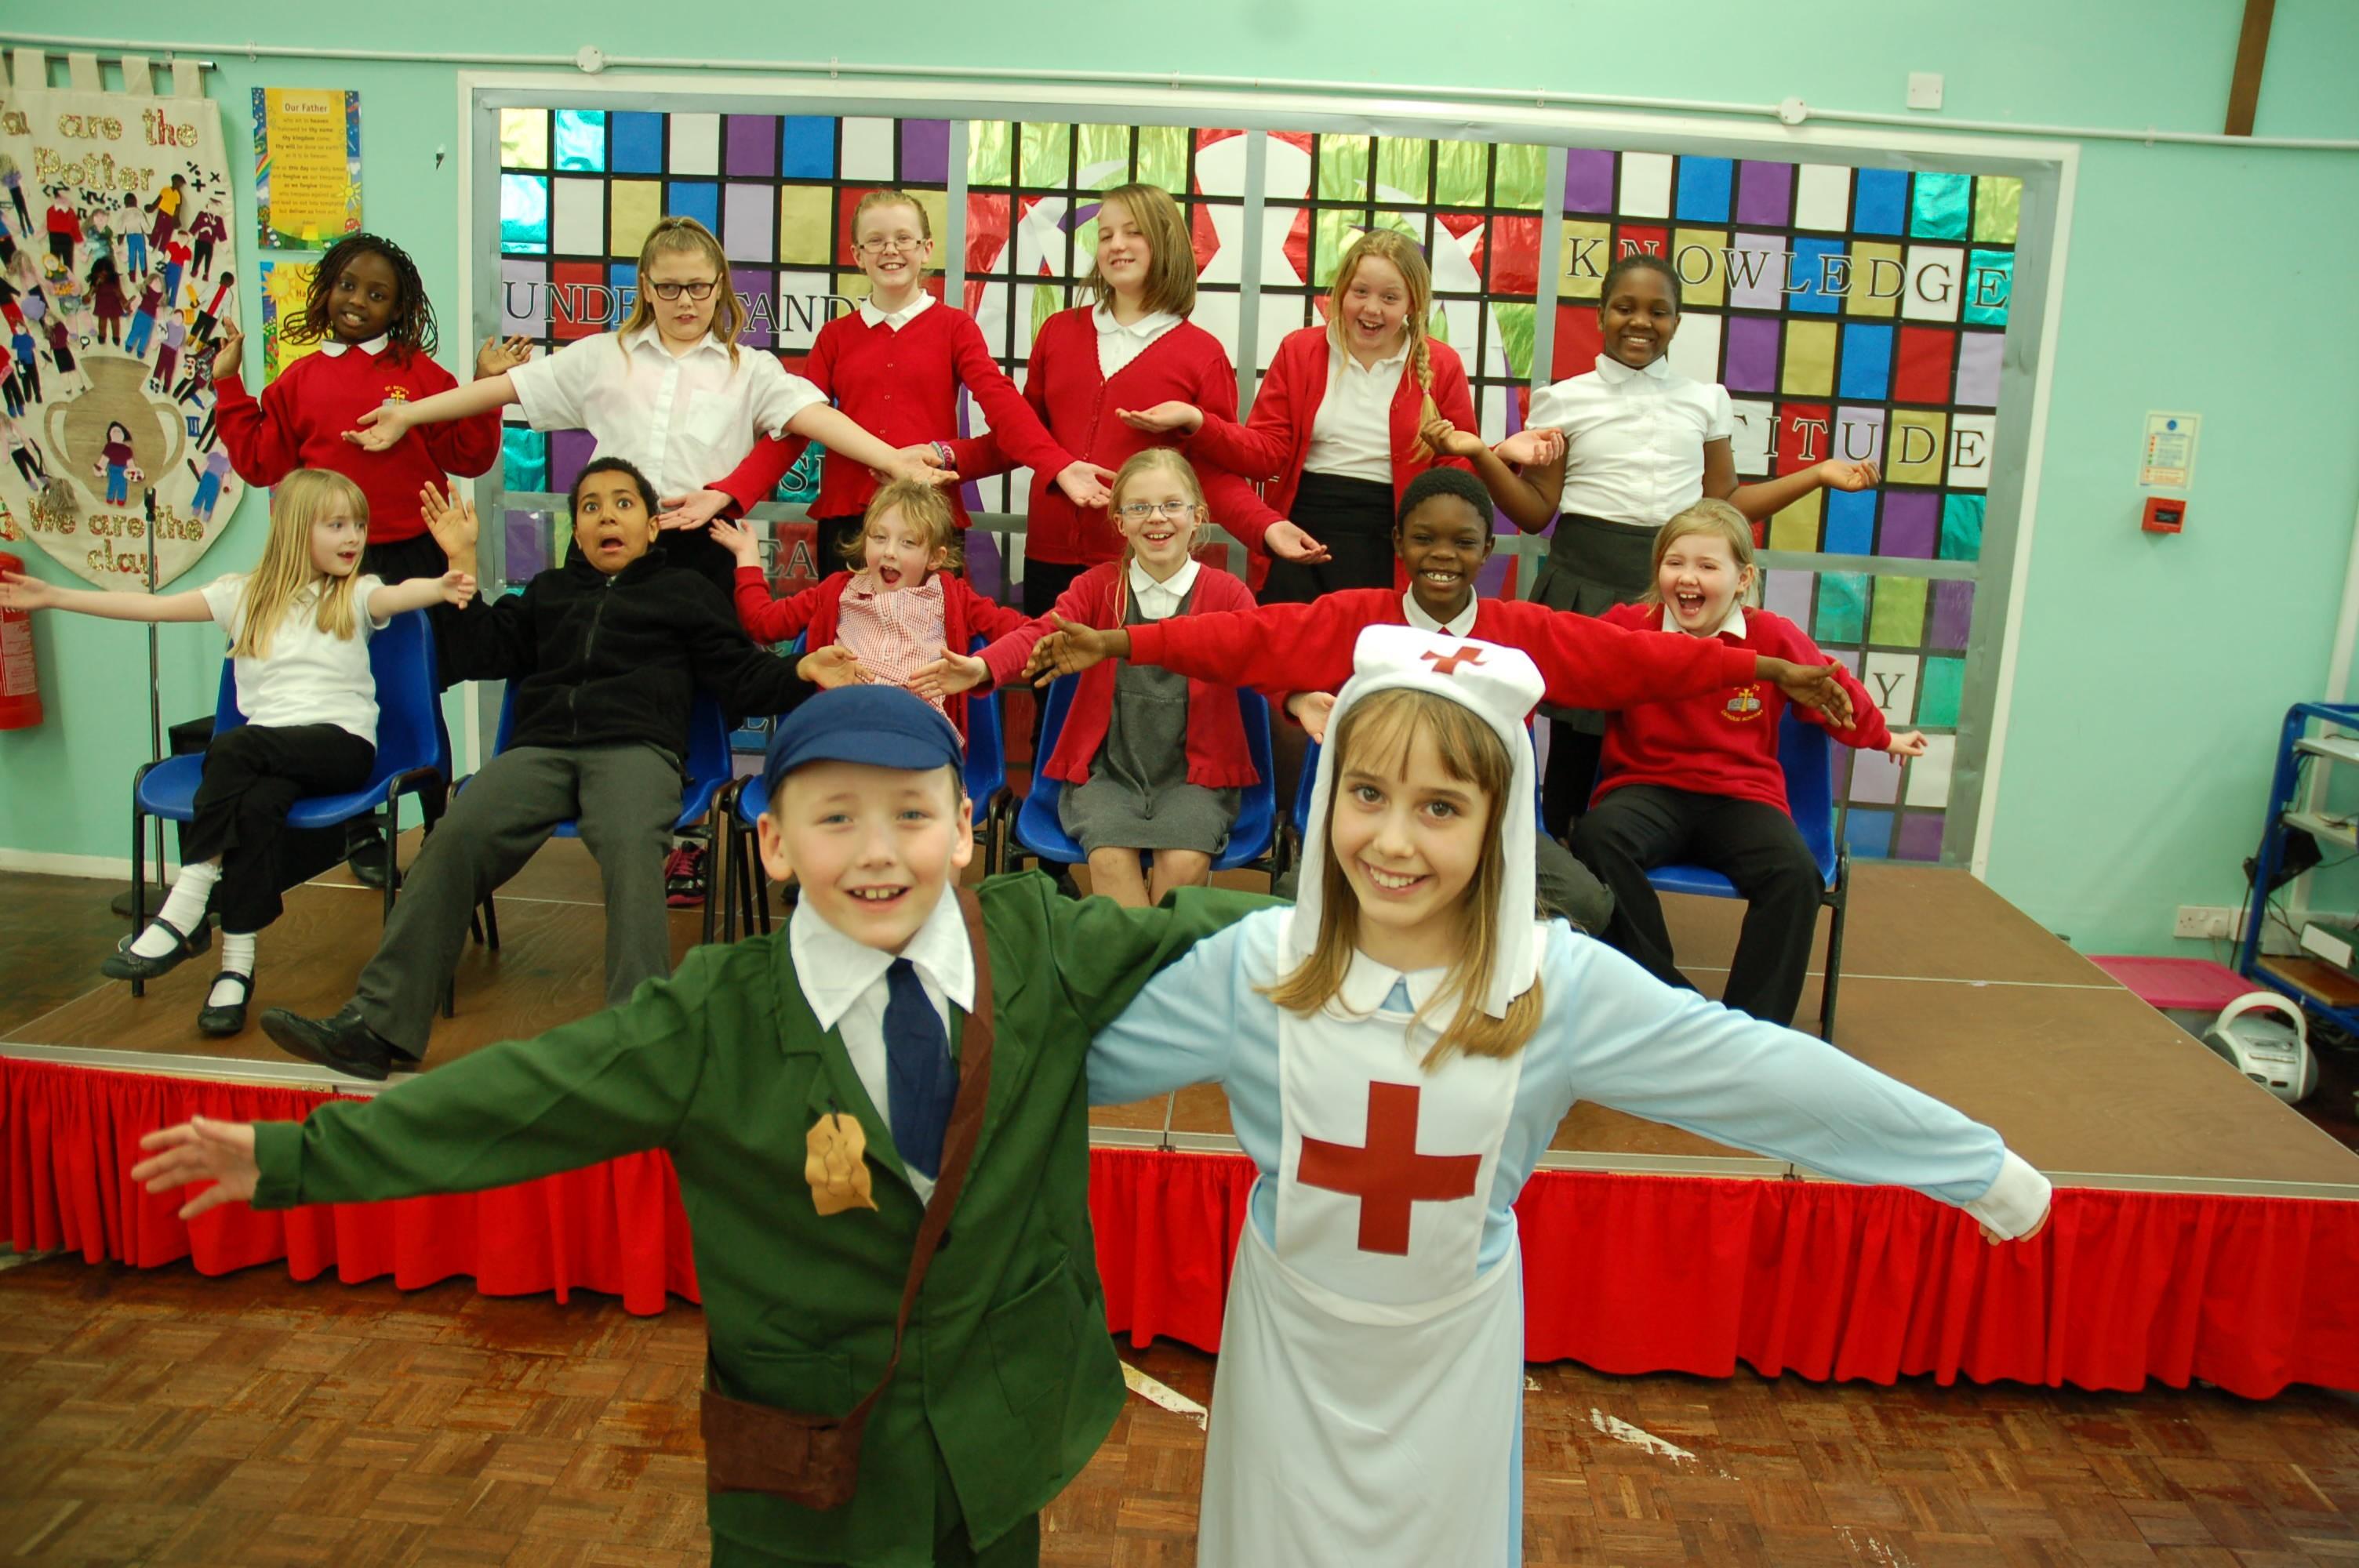 St Bede's choir 3